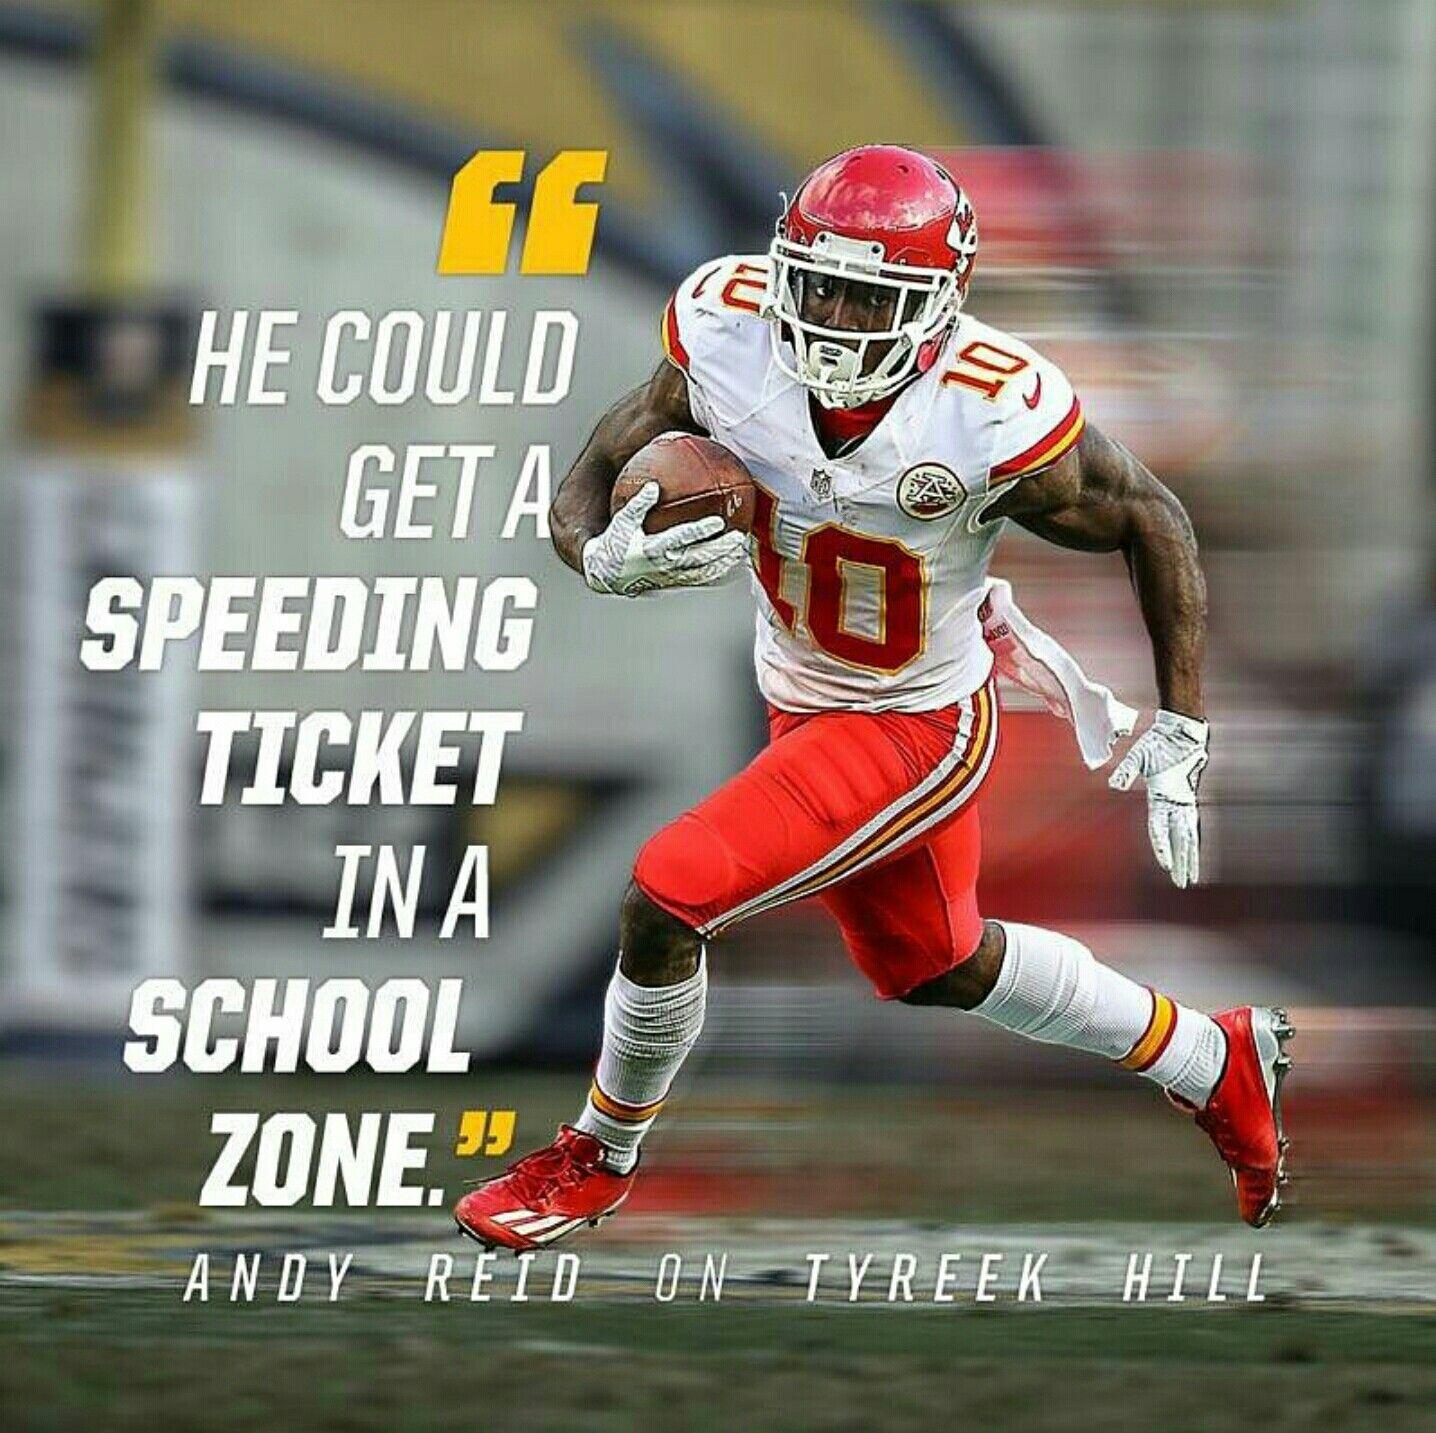 Andy Reid On Tyreek Hill Kansas City Chiefs Kansas City Chiefs Funny Kansas City Chiefs Football